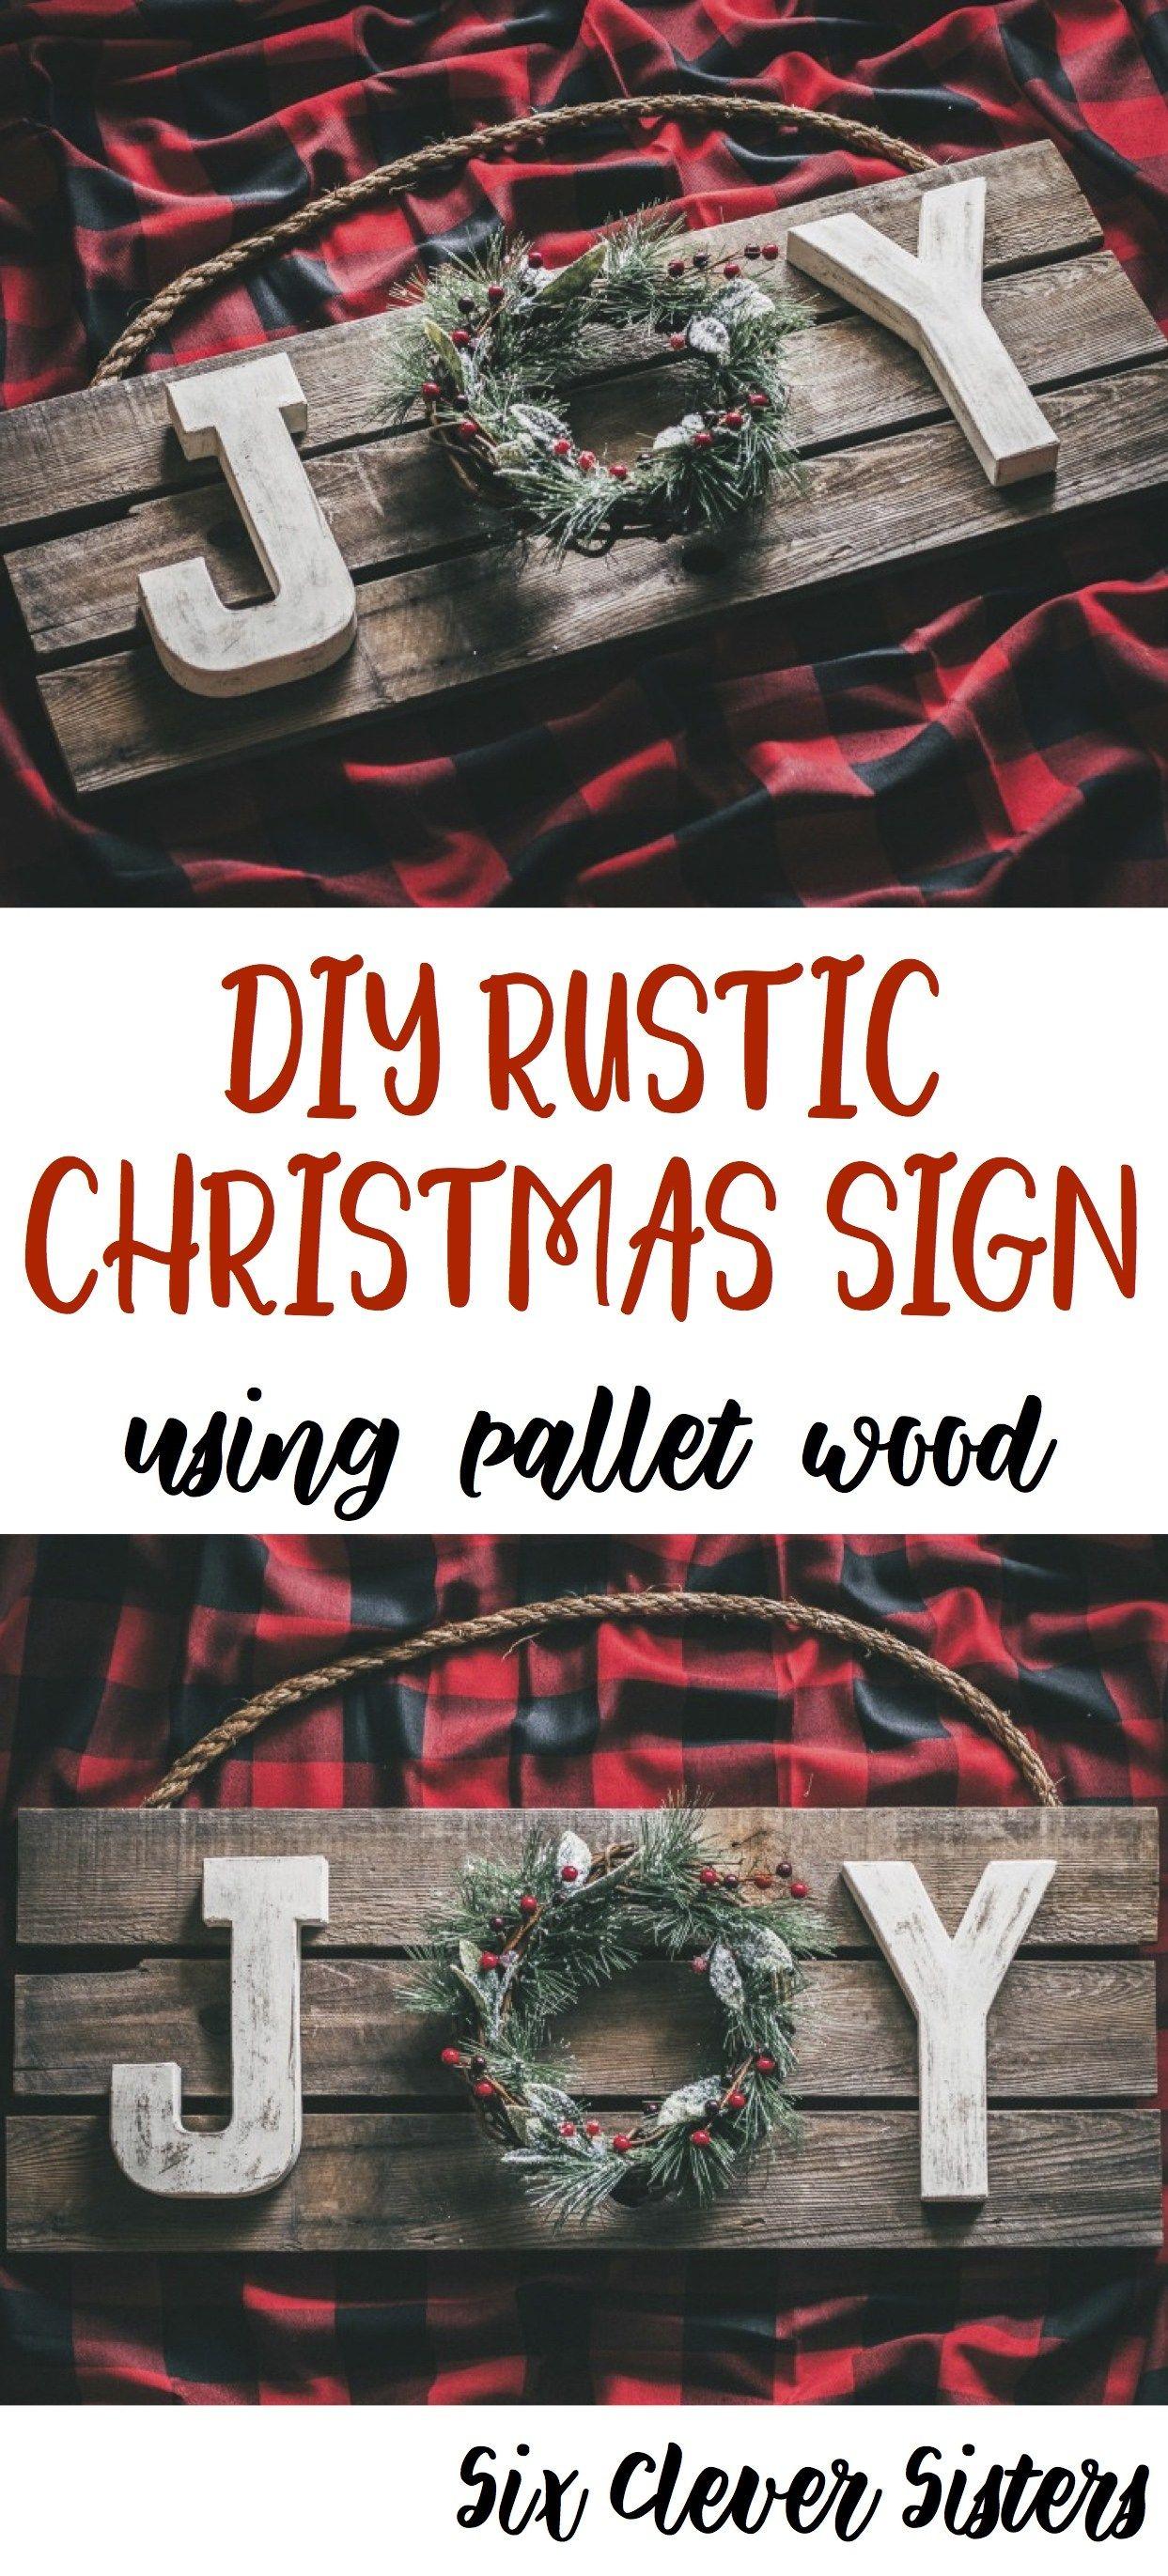 DIY Rustic Christmas Joy Sign Using Pallet Wood Xmas